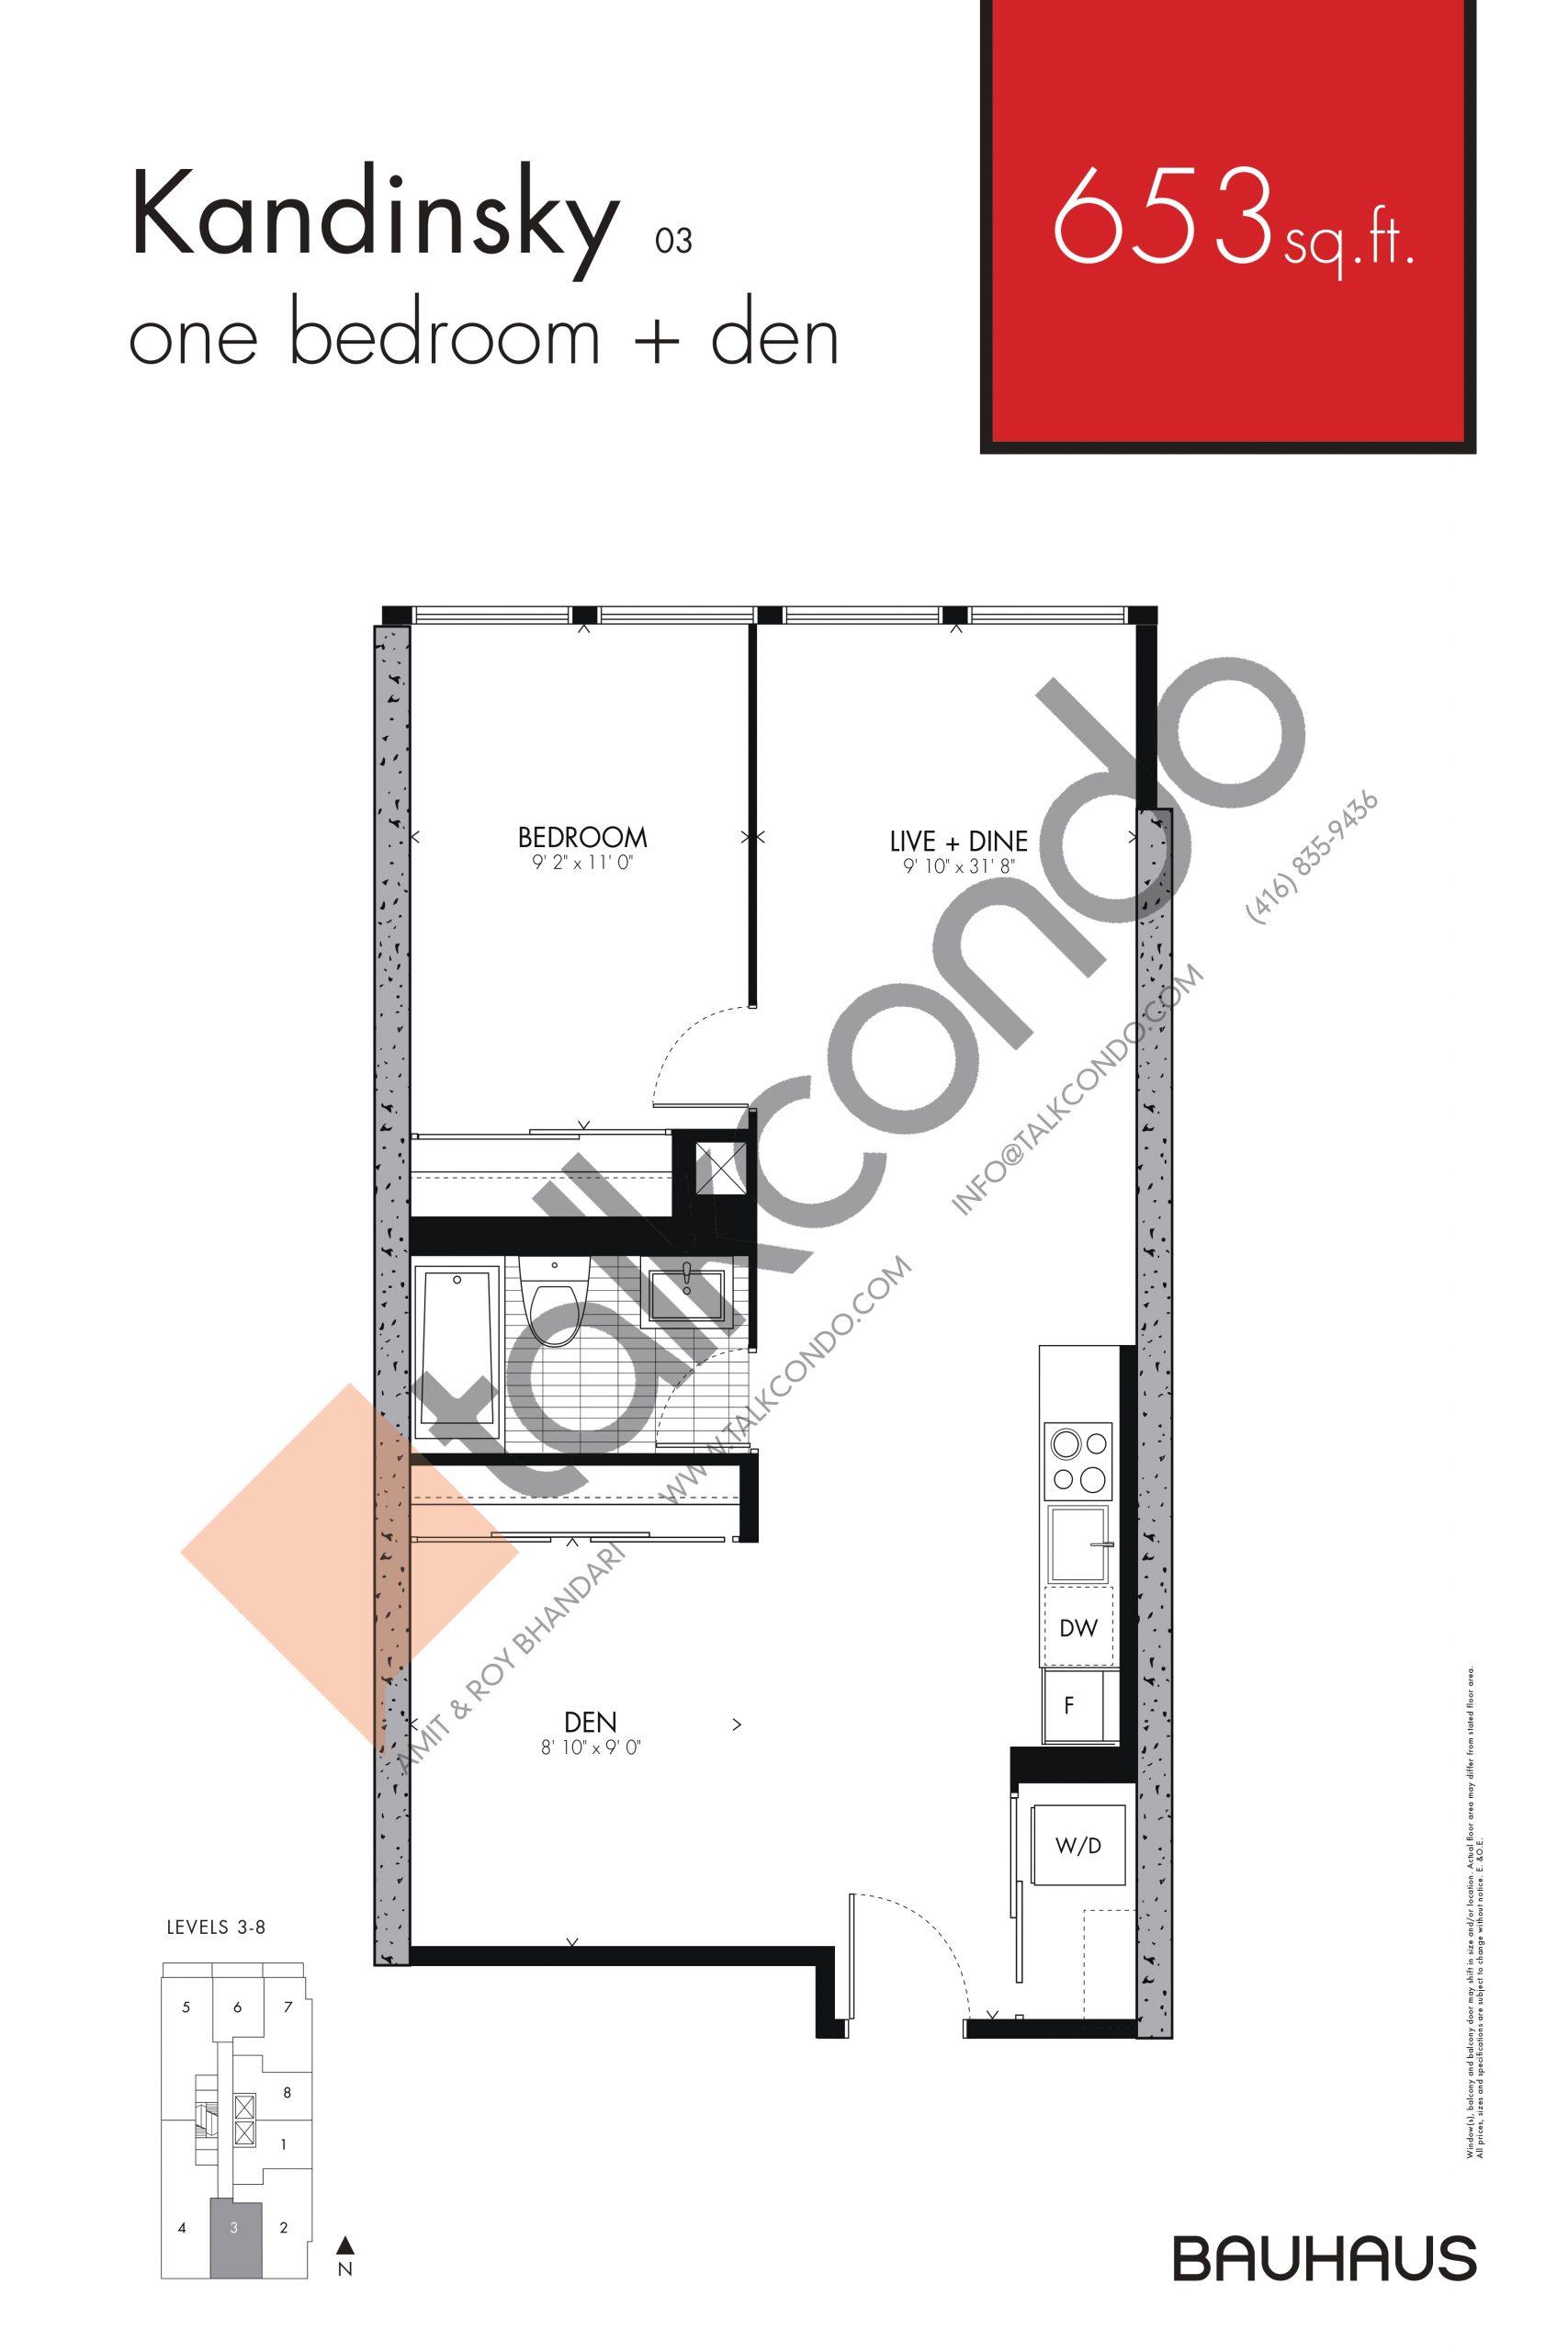 Kandinsky Floor Plan at Bauhaus Condos - 653 sq.ft